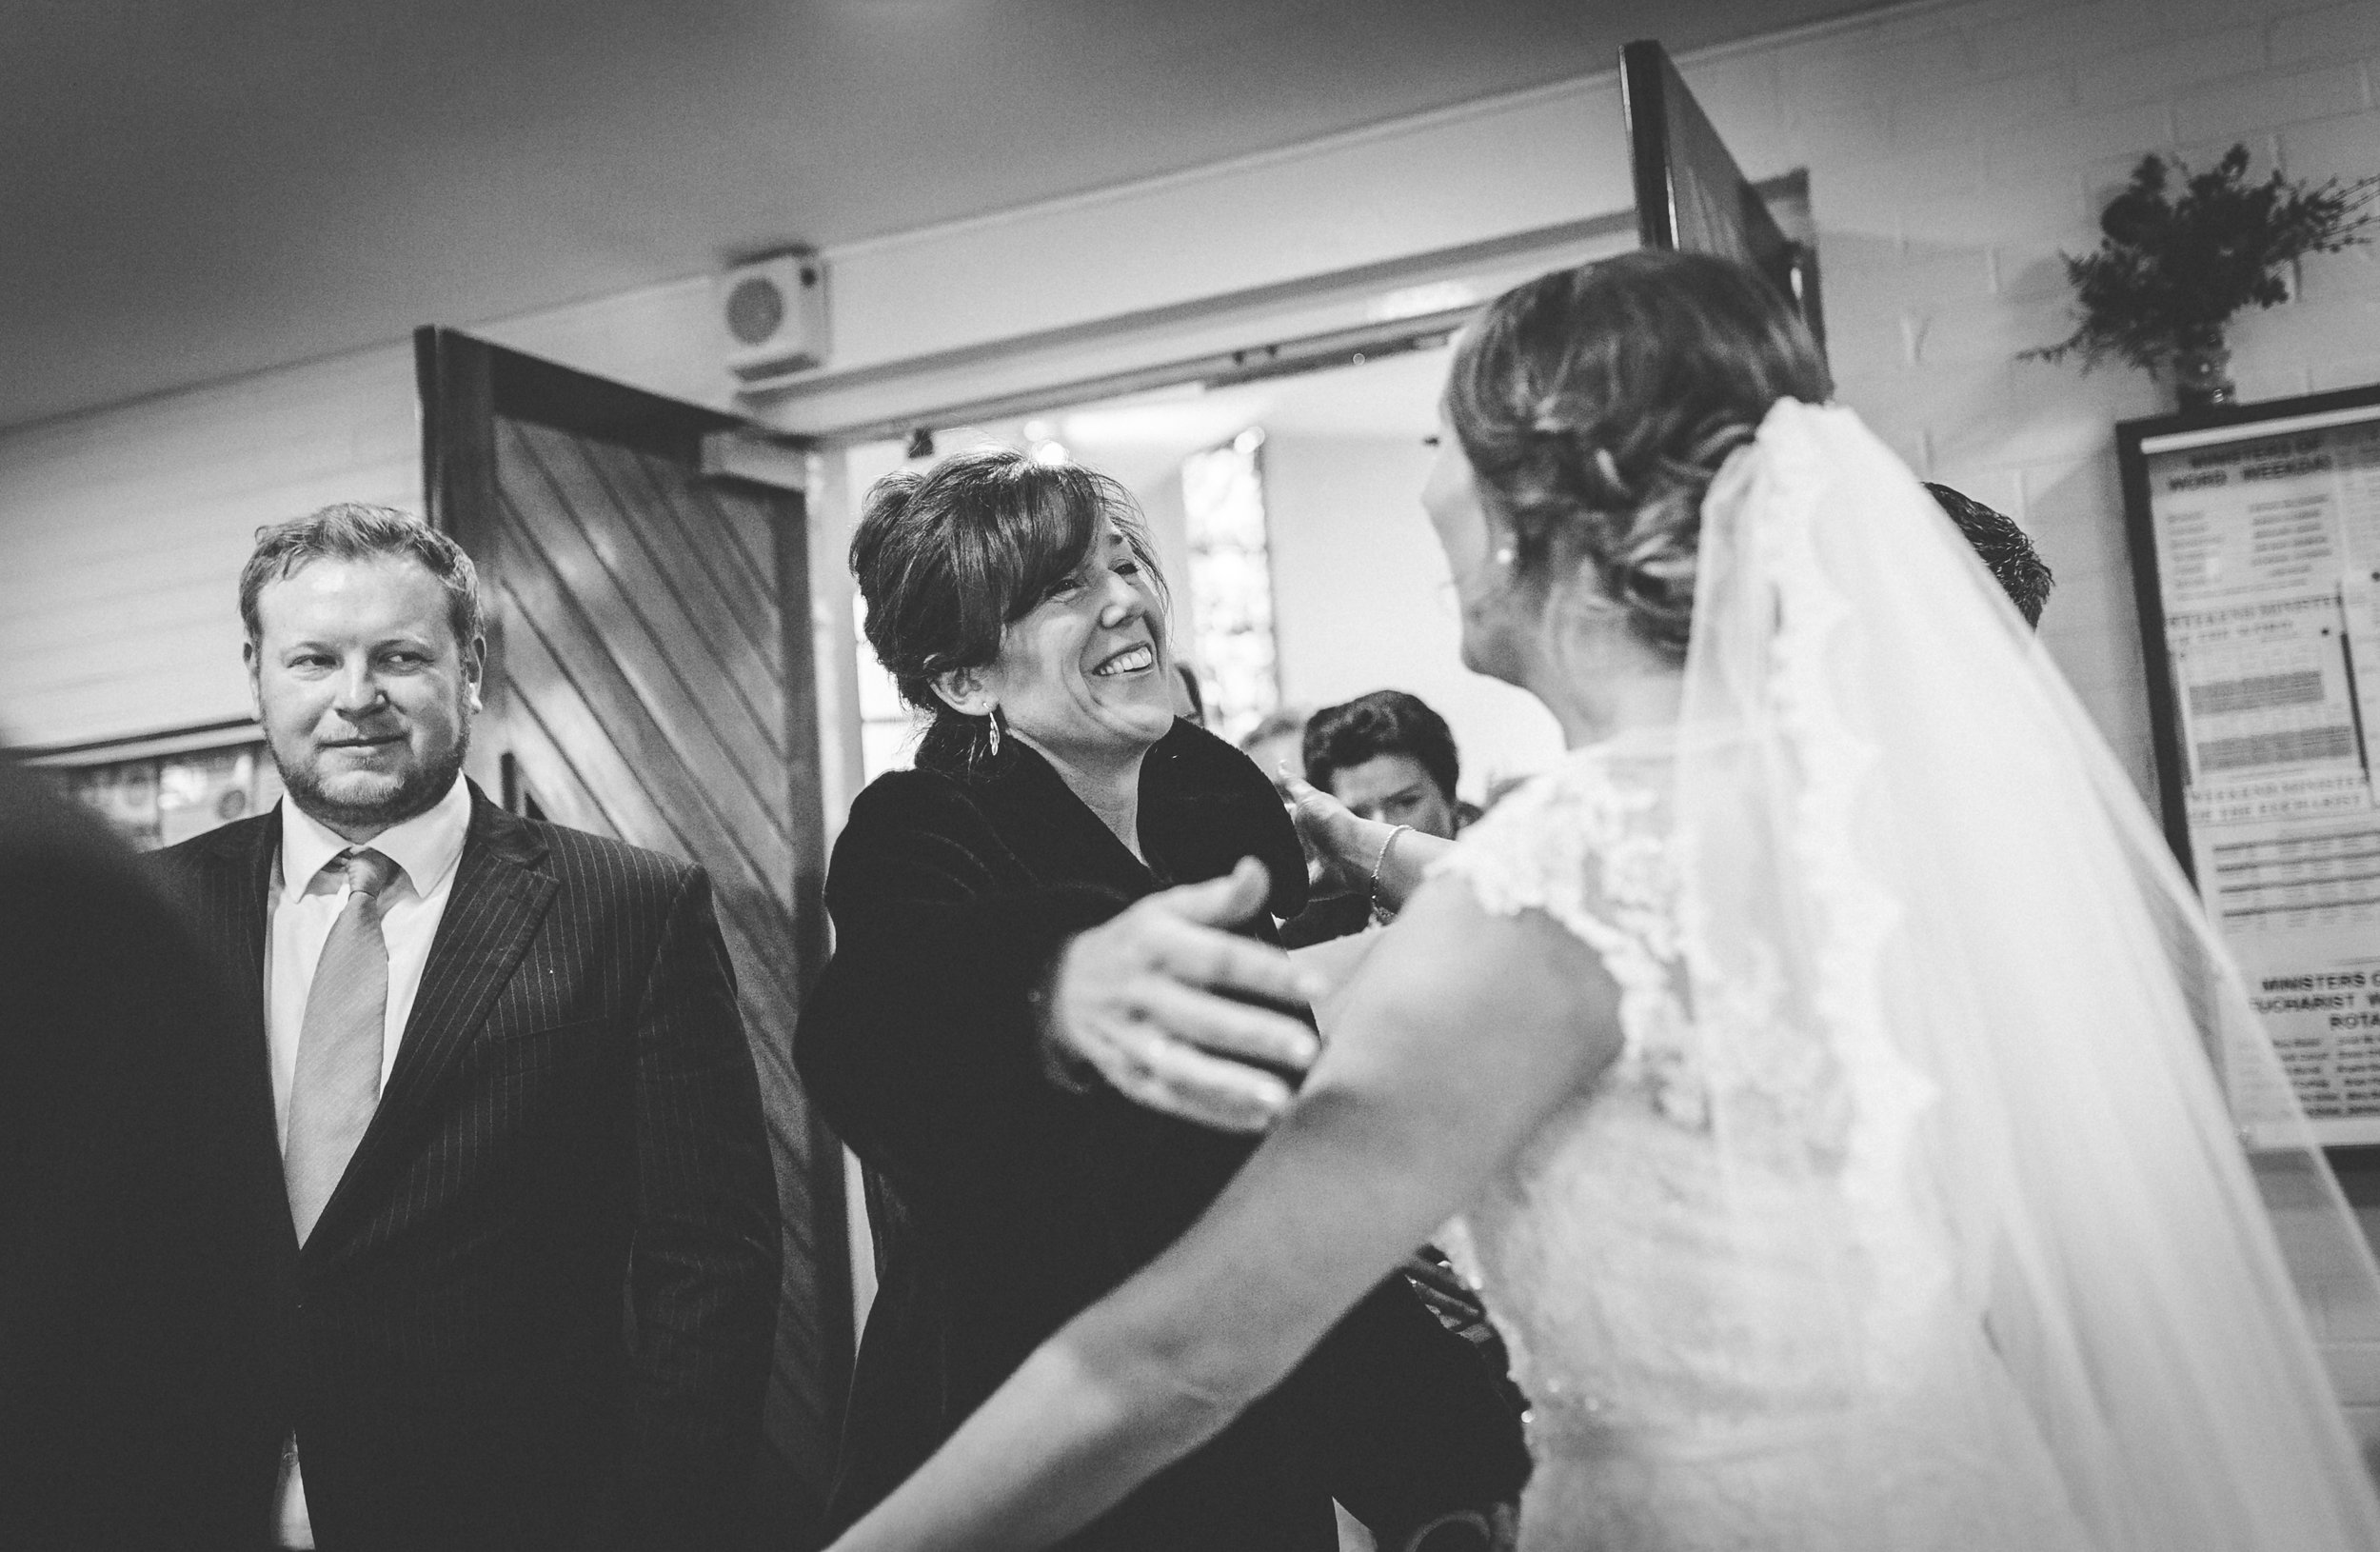 Knoghtsbrook hotel wedding049.jpg